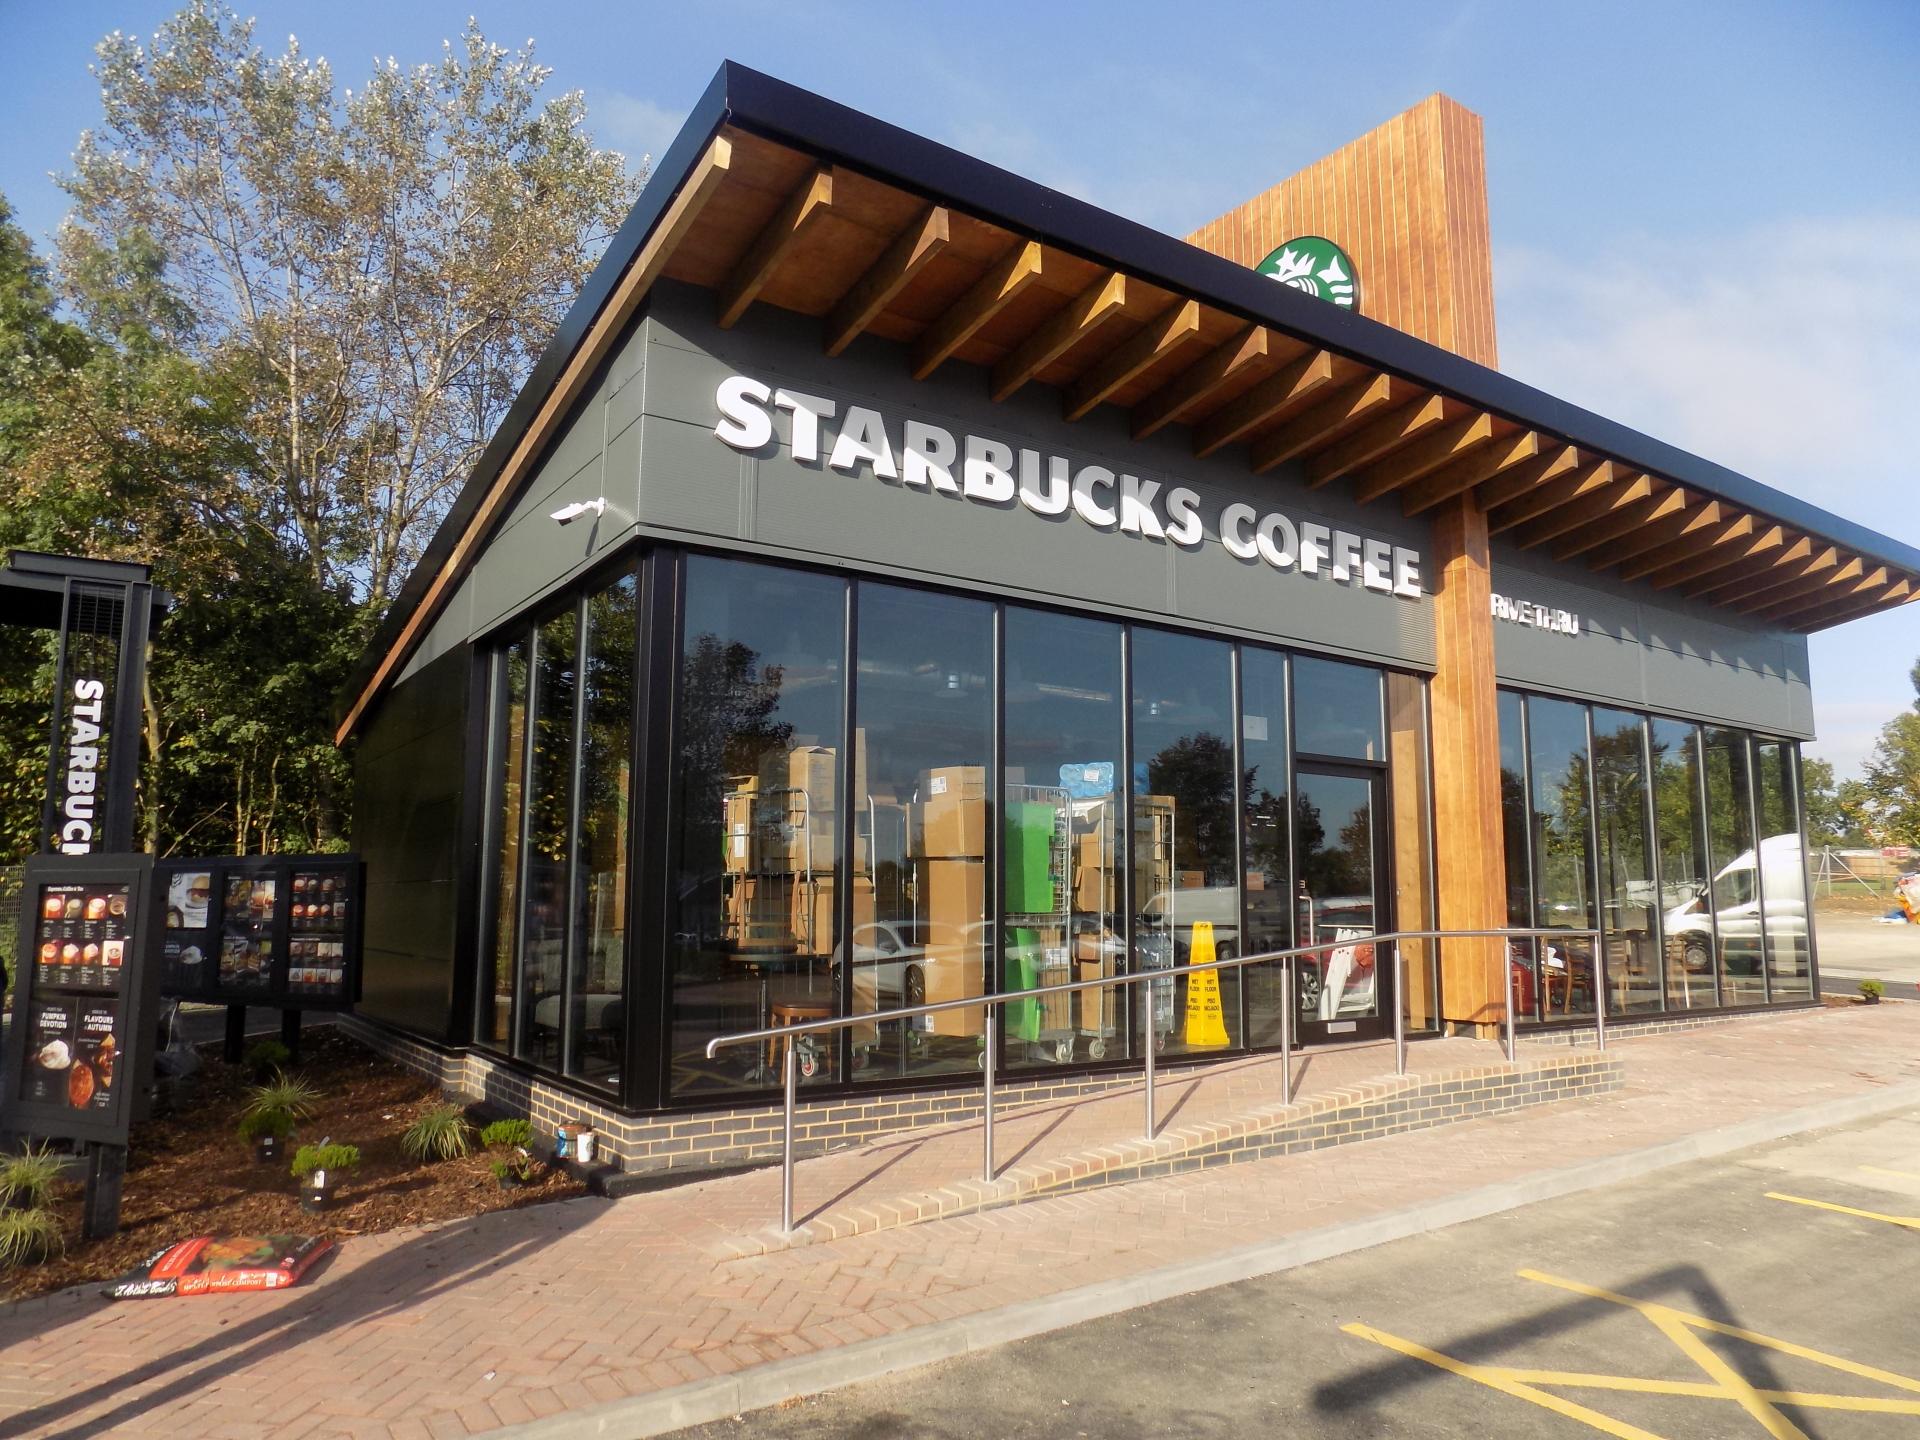 Starbucks - South Mimms